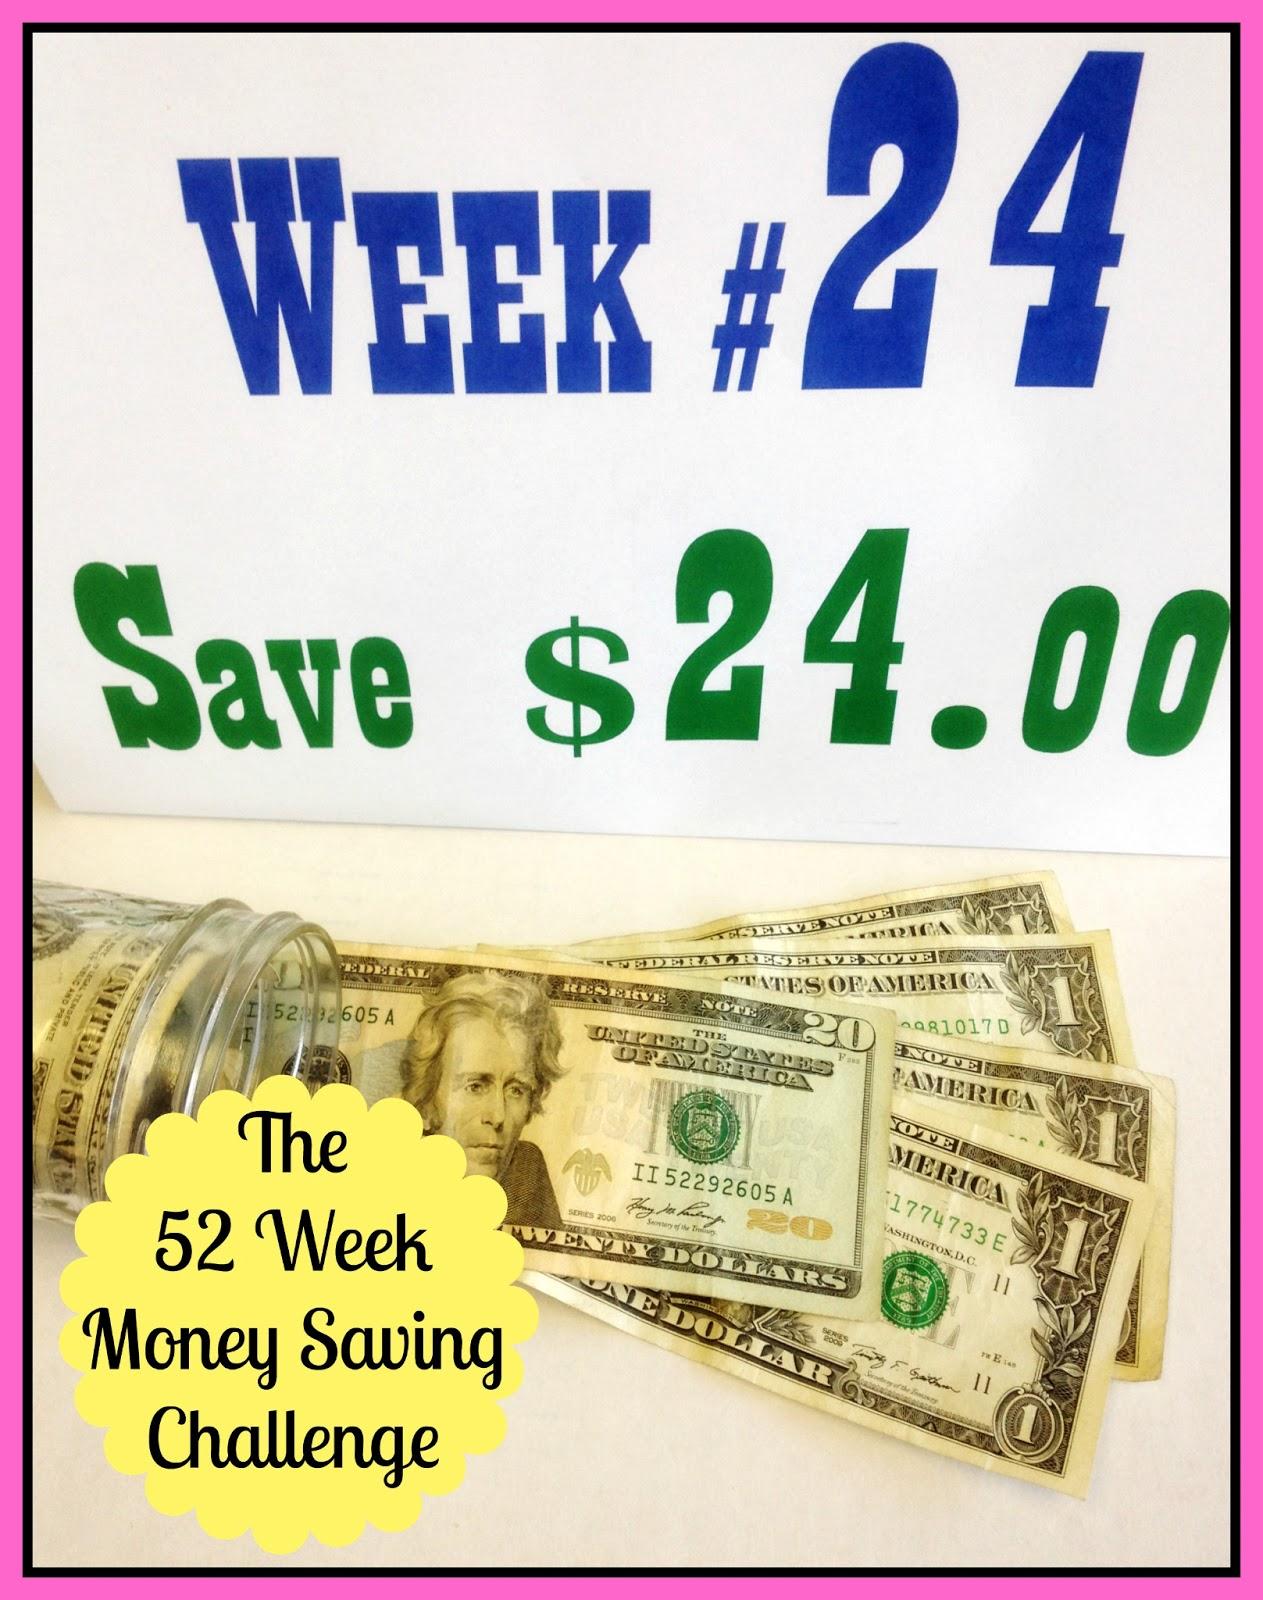 The 52 Week Money Saving Challenge - Week #24